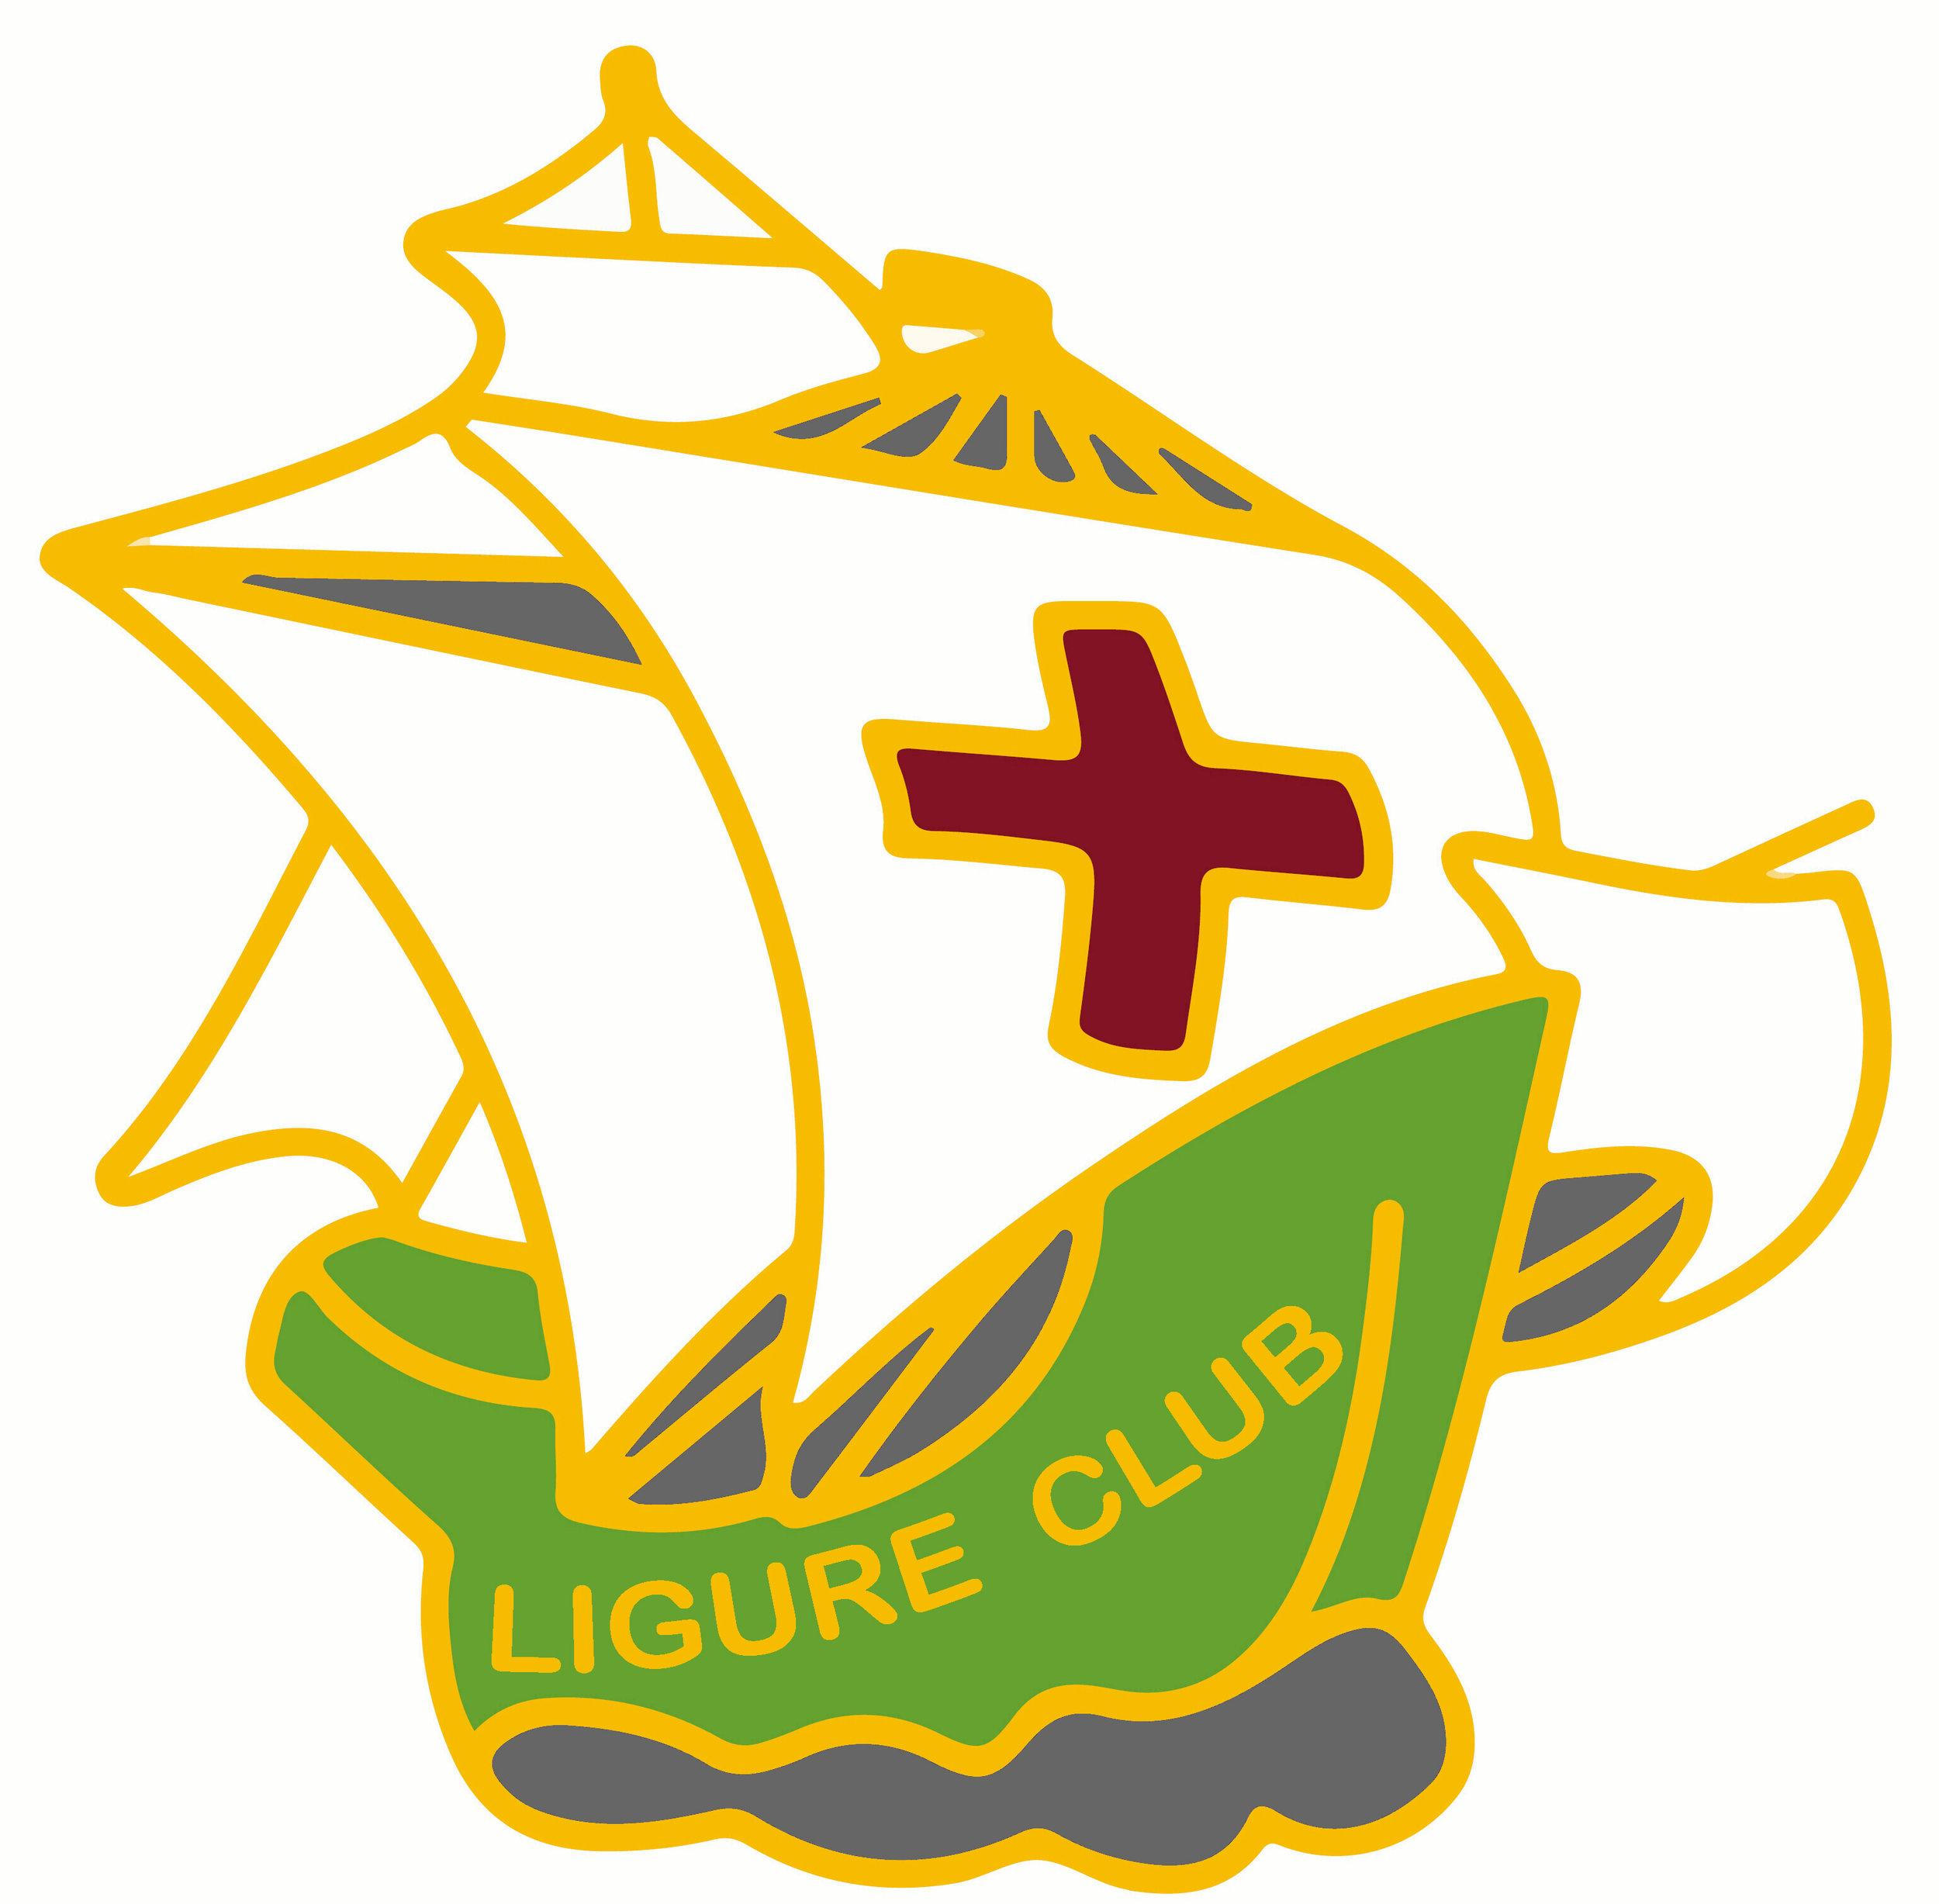 Ligure Club